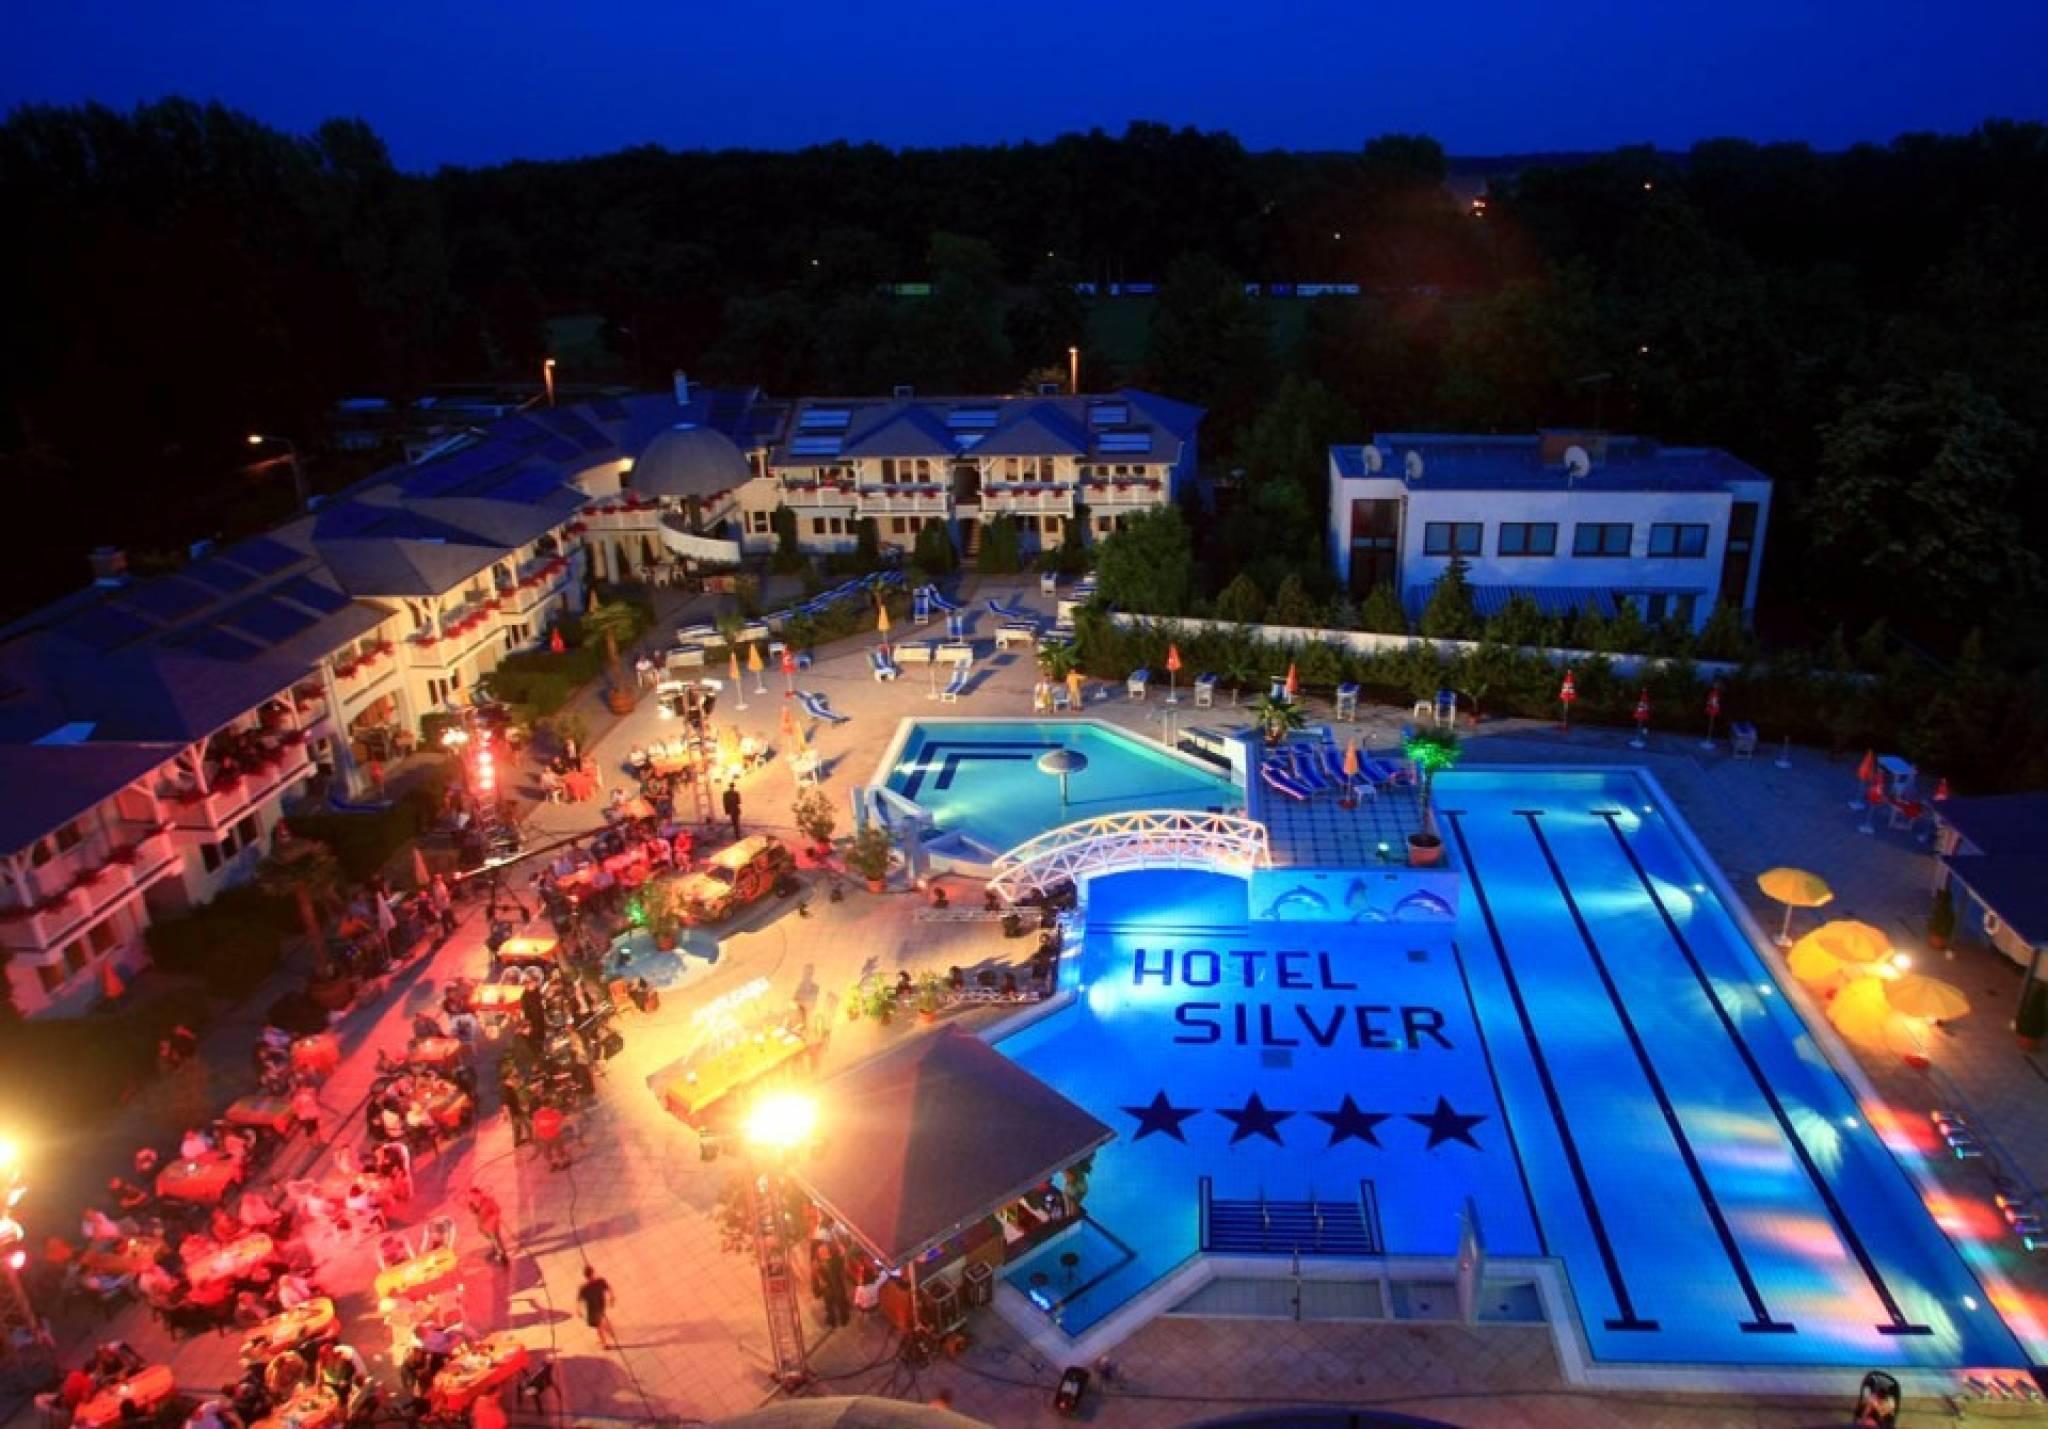 Hotel Silver Hajduszoboszlo 2